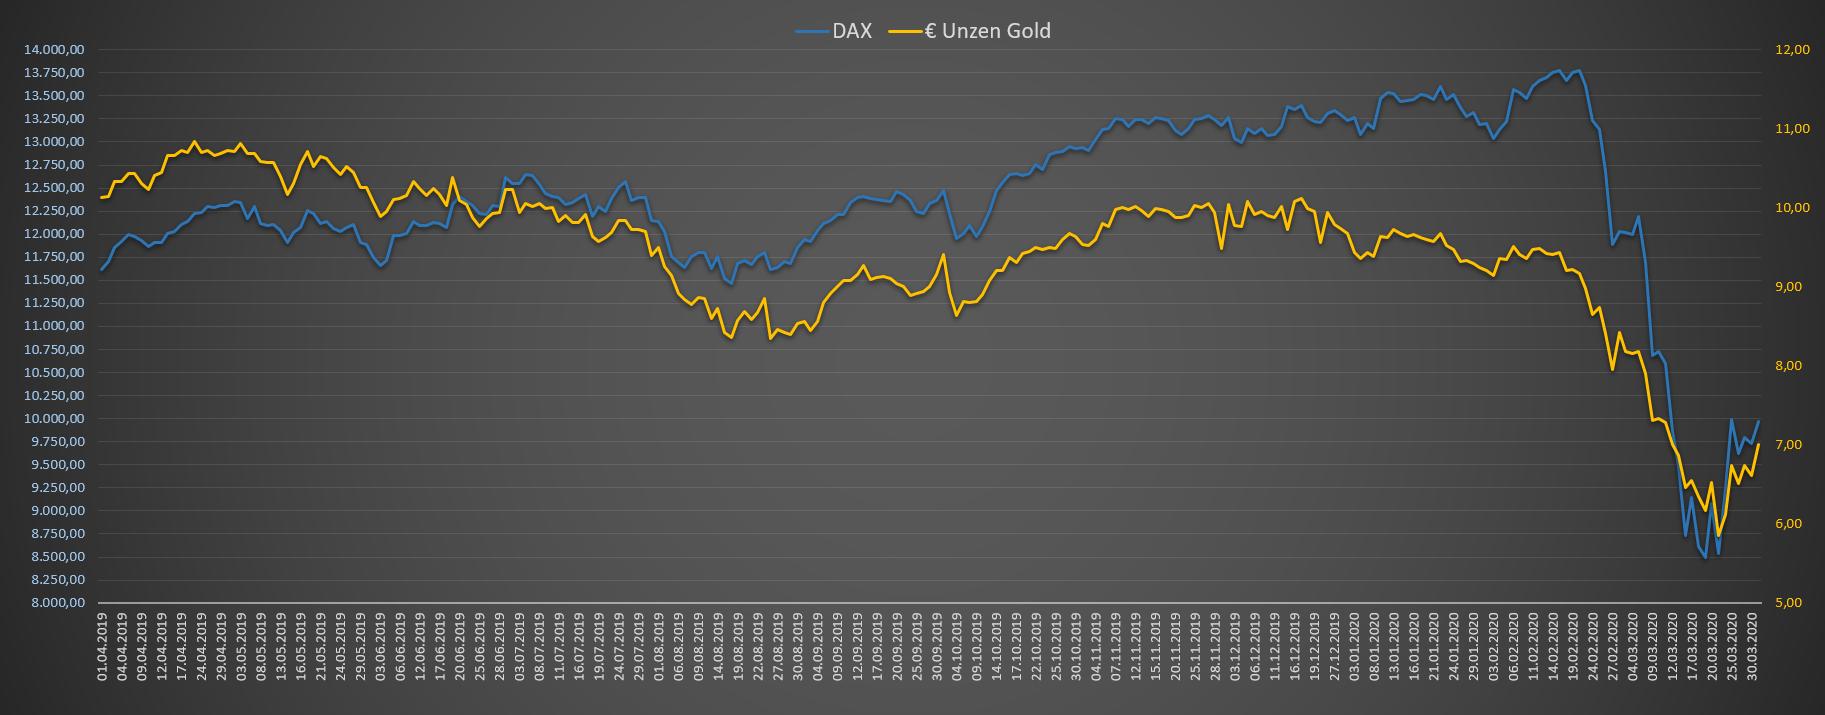 DAX Bewertung in Unzen Gold in Euro - Chart 12 Monate